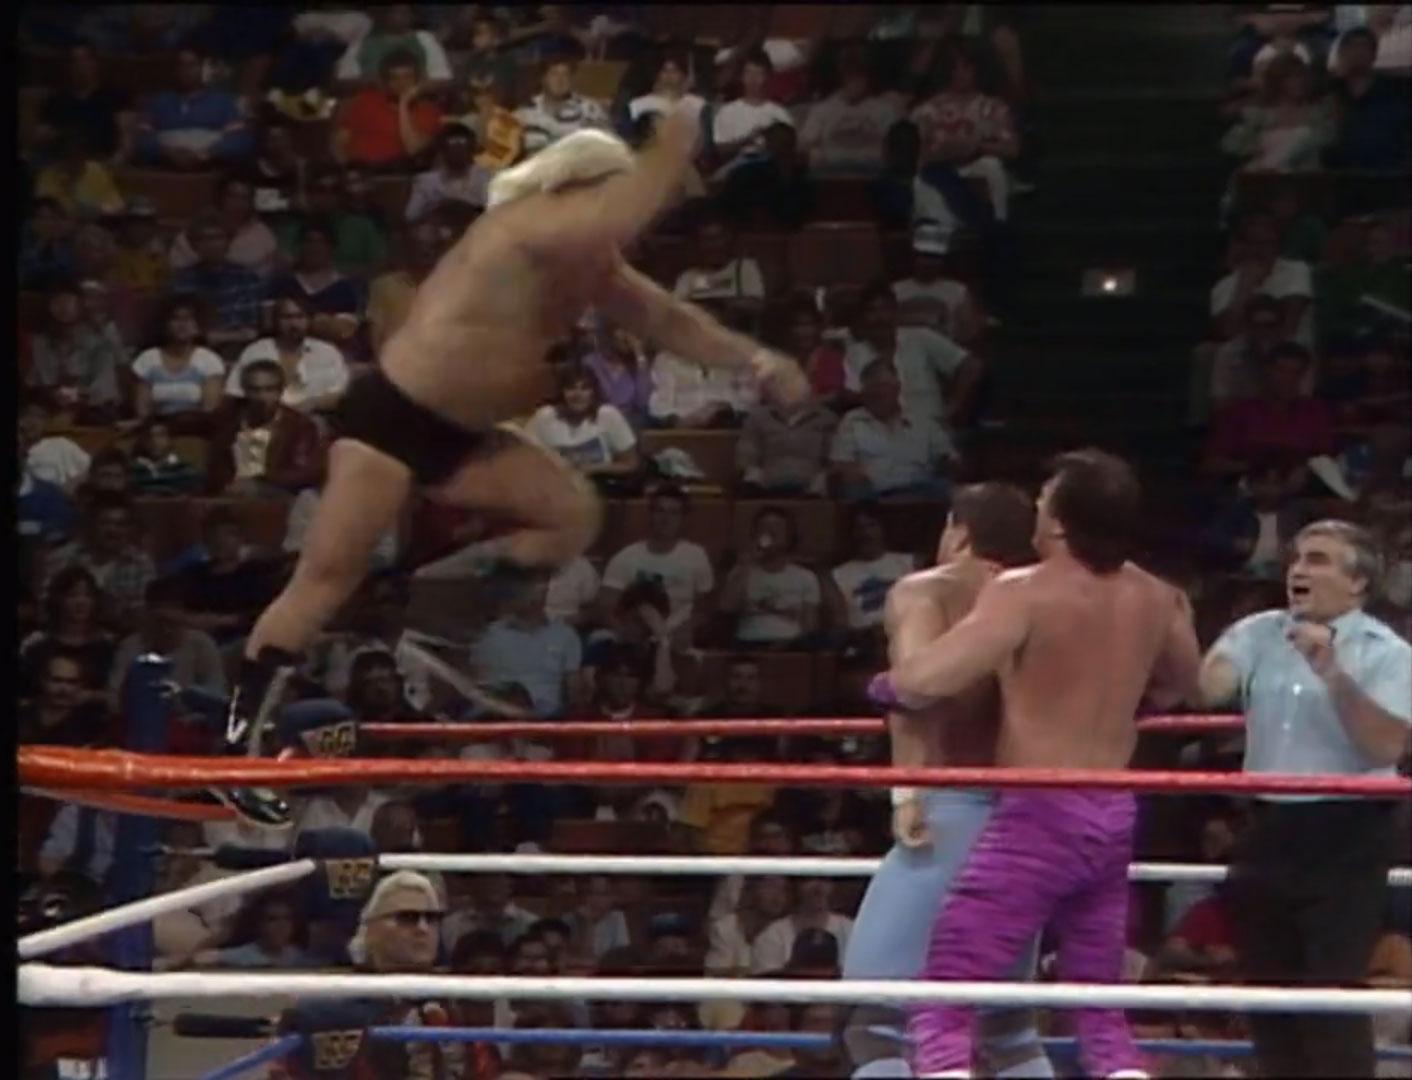 The Dream Team vs. The British Bulldog 2/3 Falls, WWF Saturday Night's Main Event October 4th, 1986